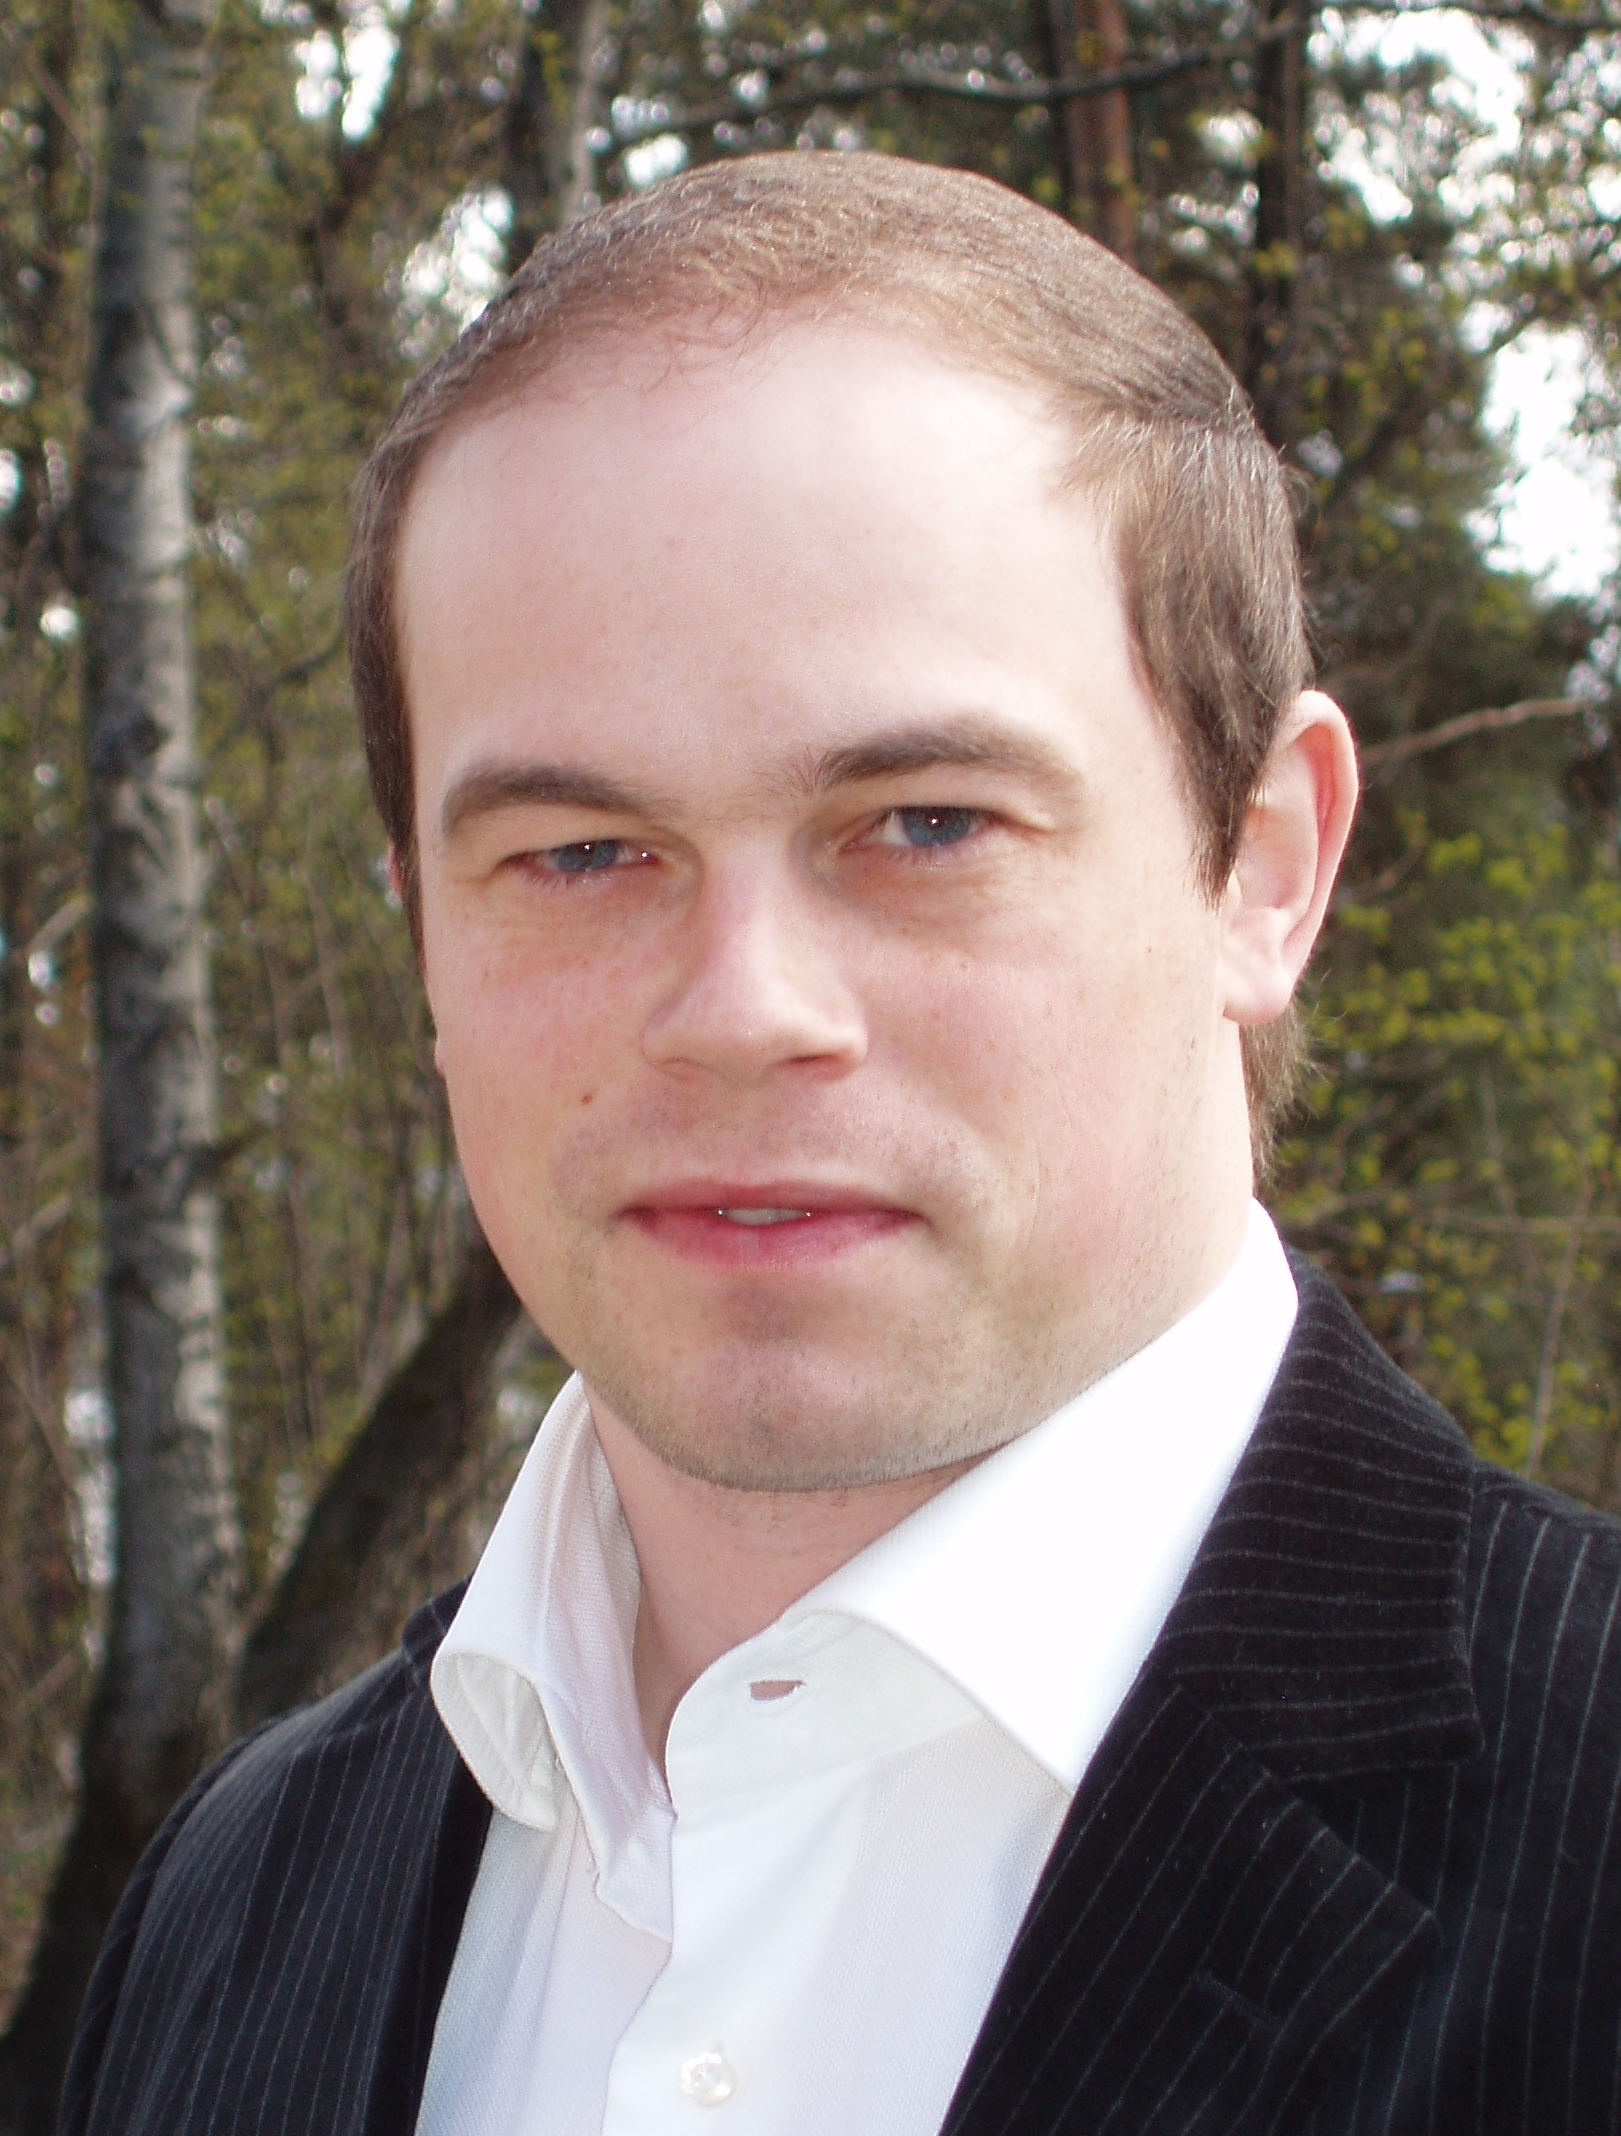 Øystein Jensen, senior research fellow at FNI. Photo: Jan D. Sørensen